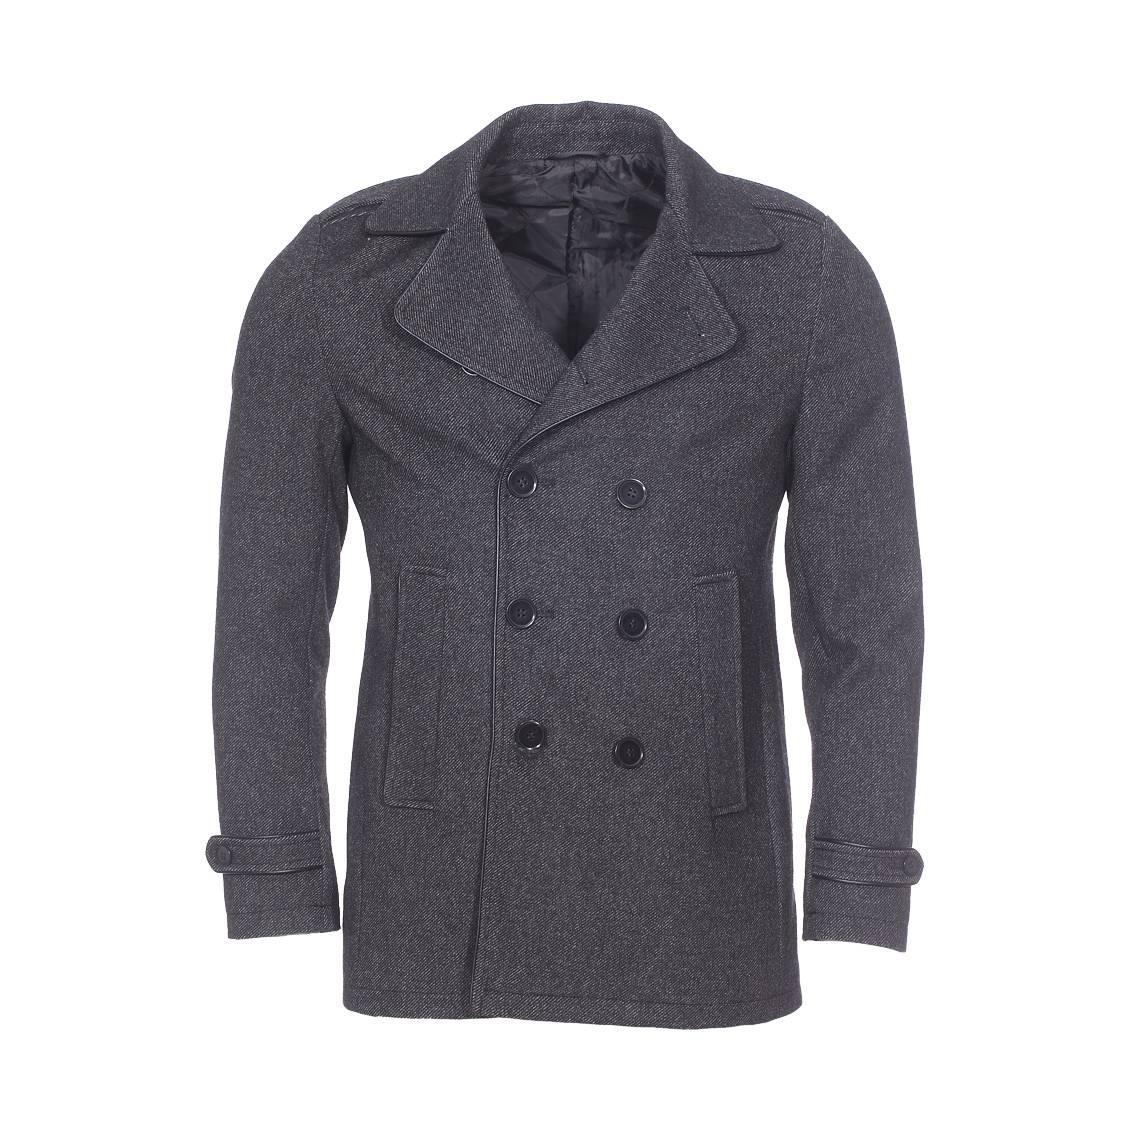 Gianni ferrucci - manteau, caban, duffle coat